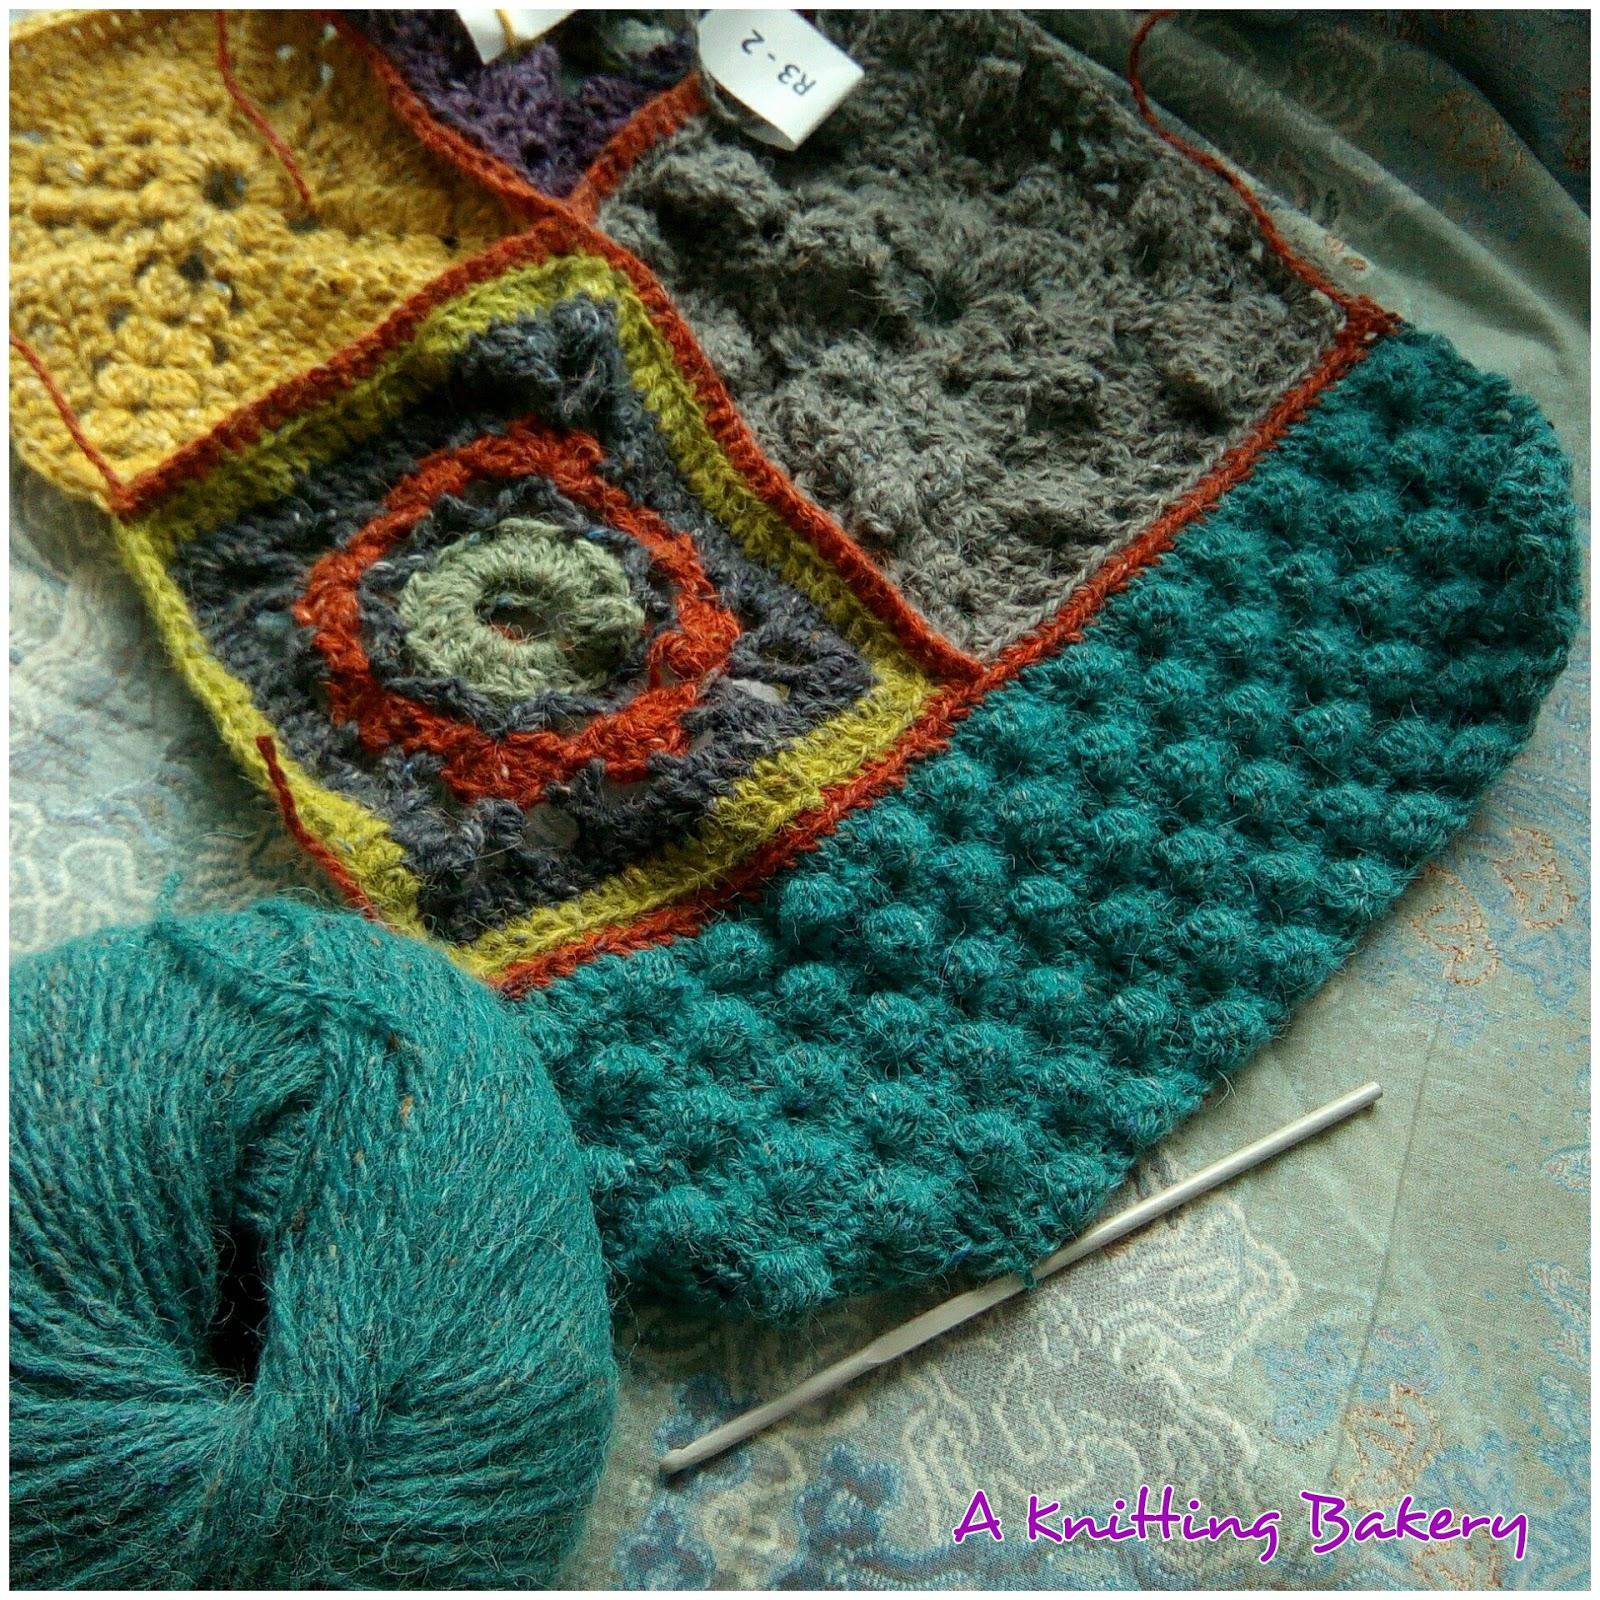 A Knitting Bakery